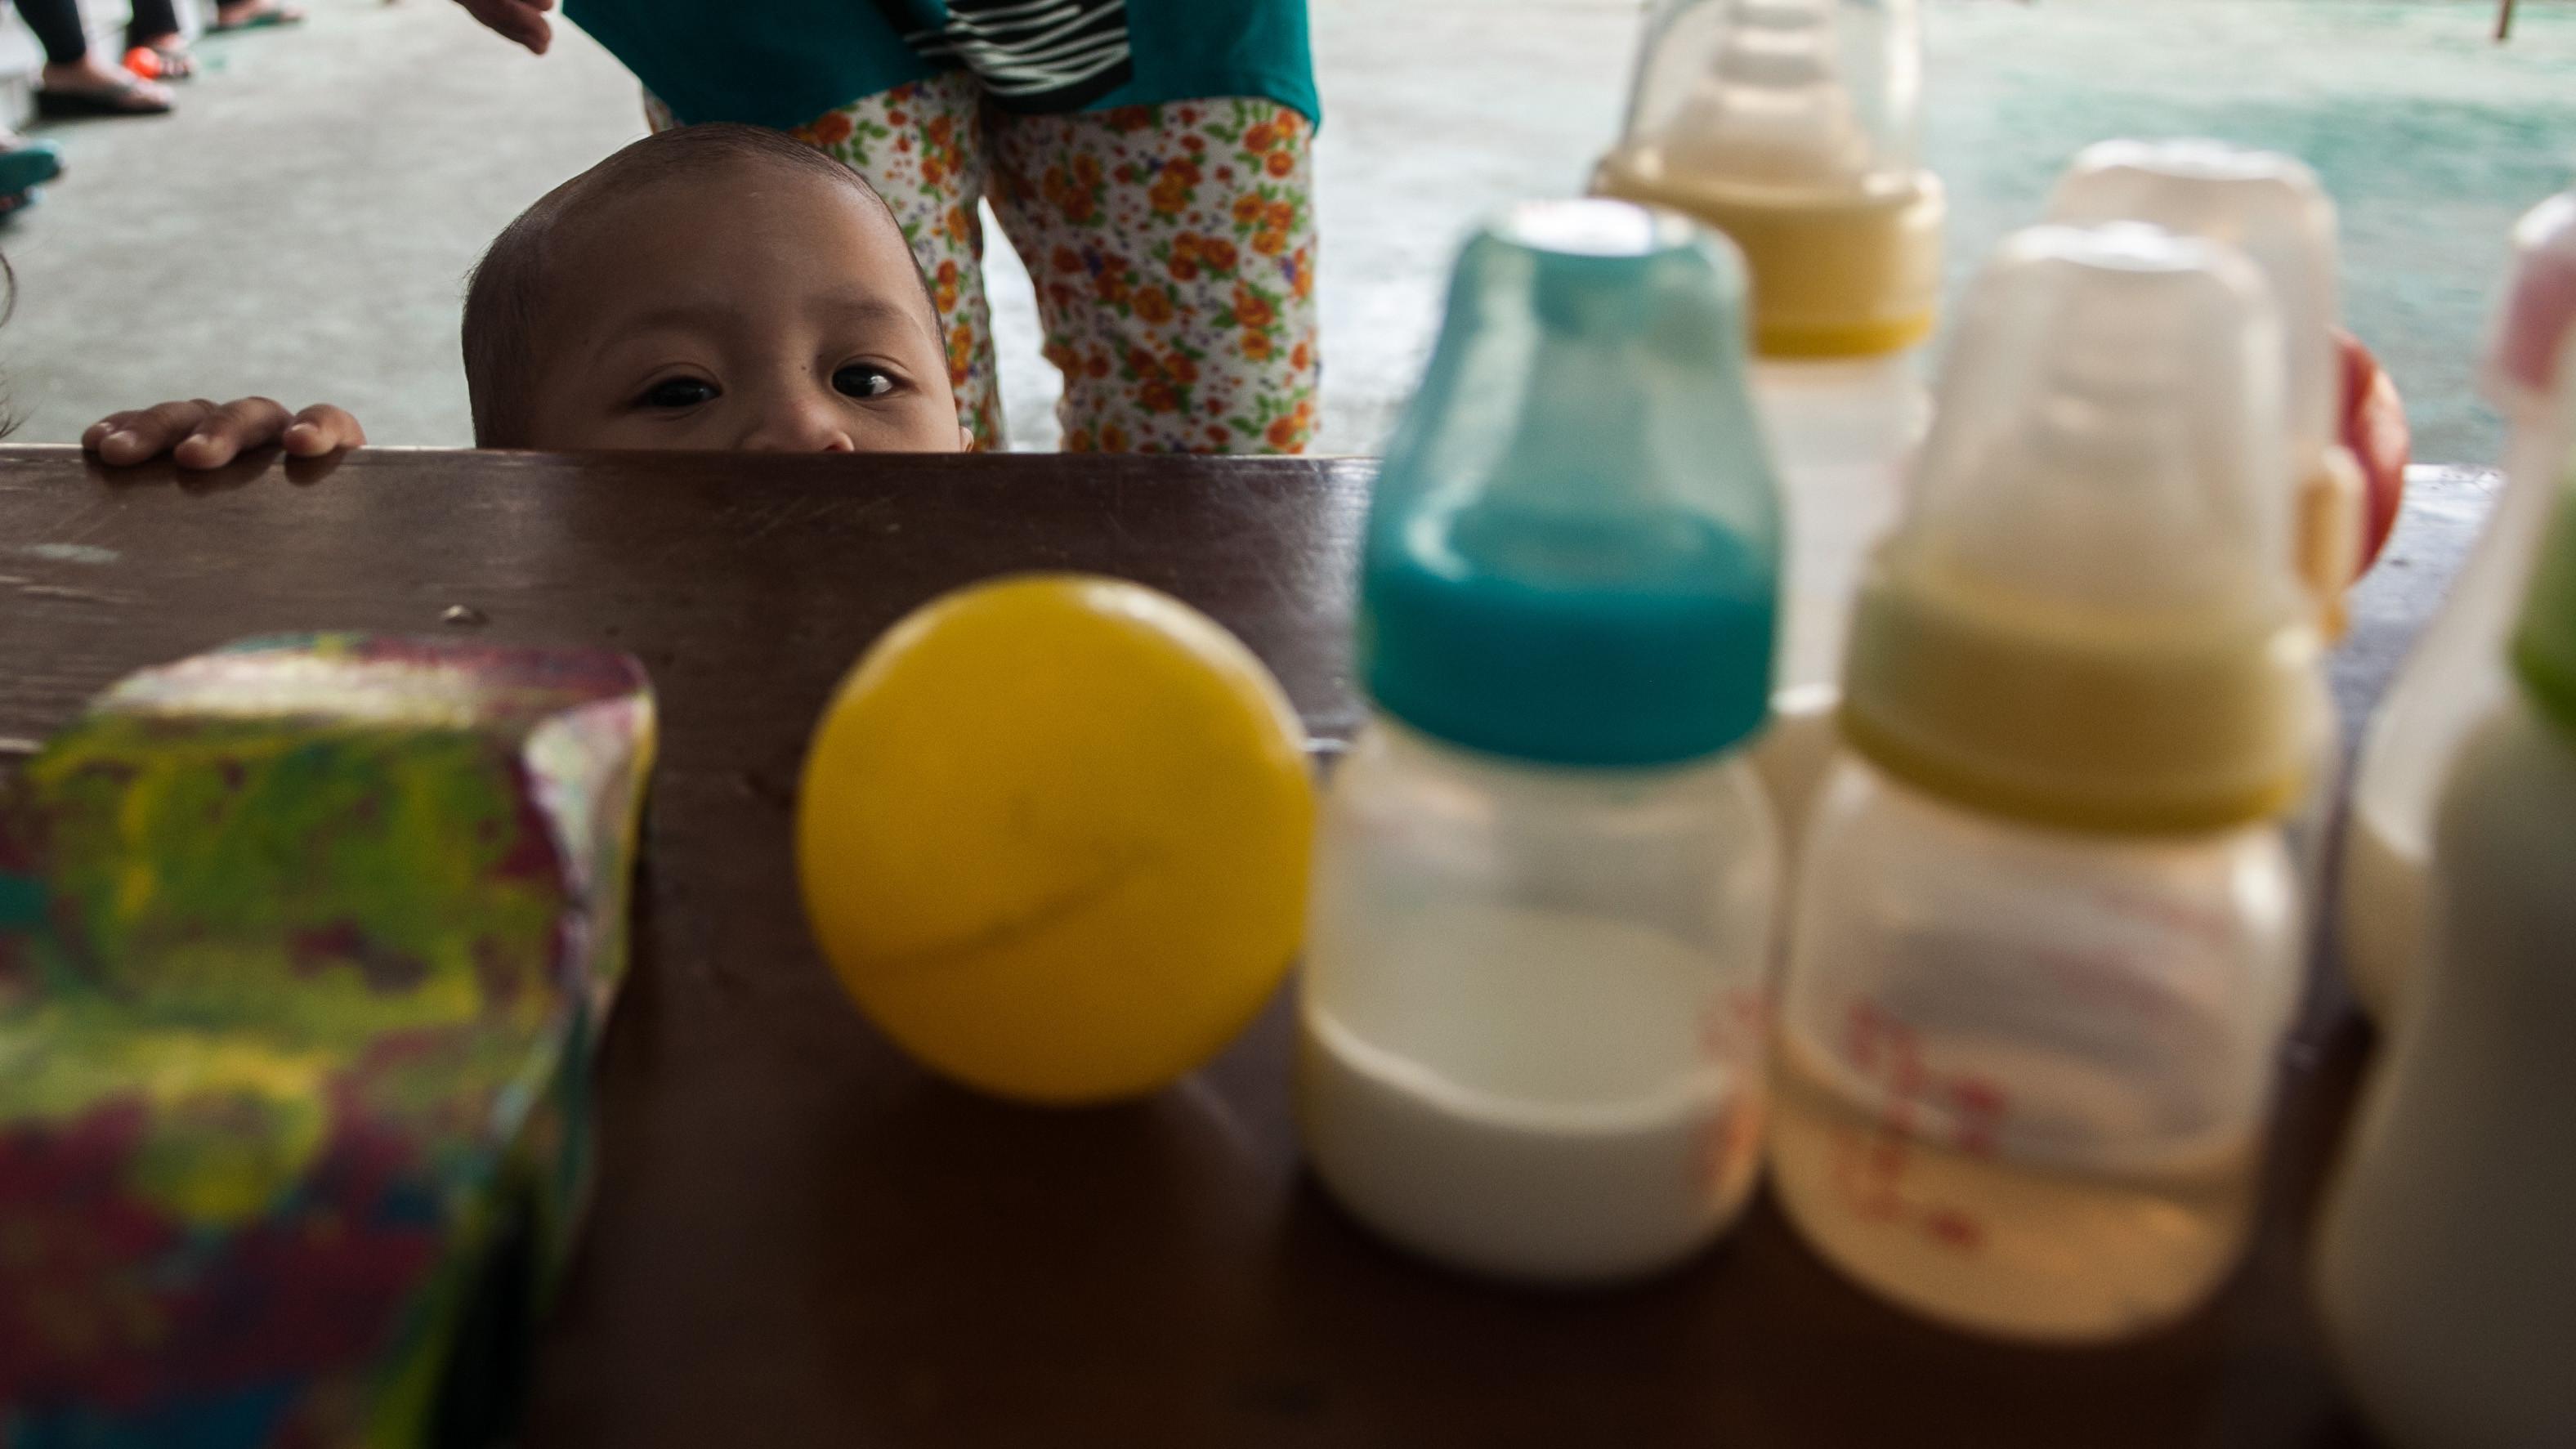 Anak dari salah satu warga binaan Lapas Pondok Bambu sedang bermain di halaman lapas (Liputan6.com/Yoppy Renato)